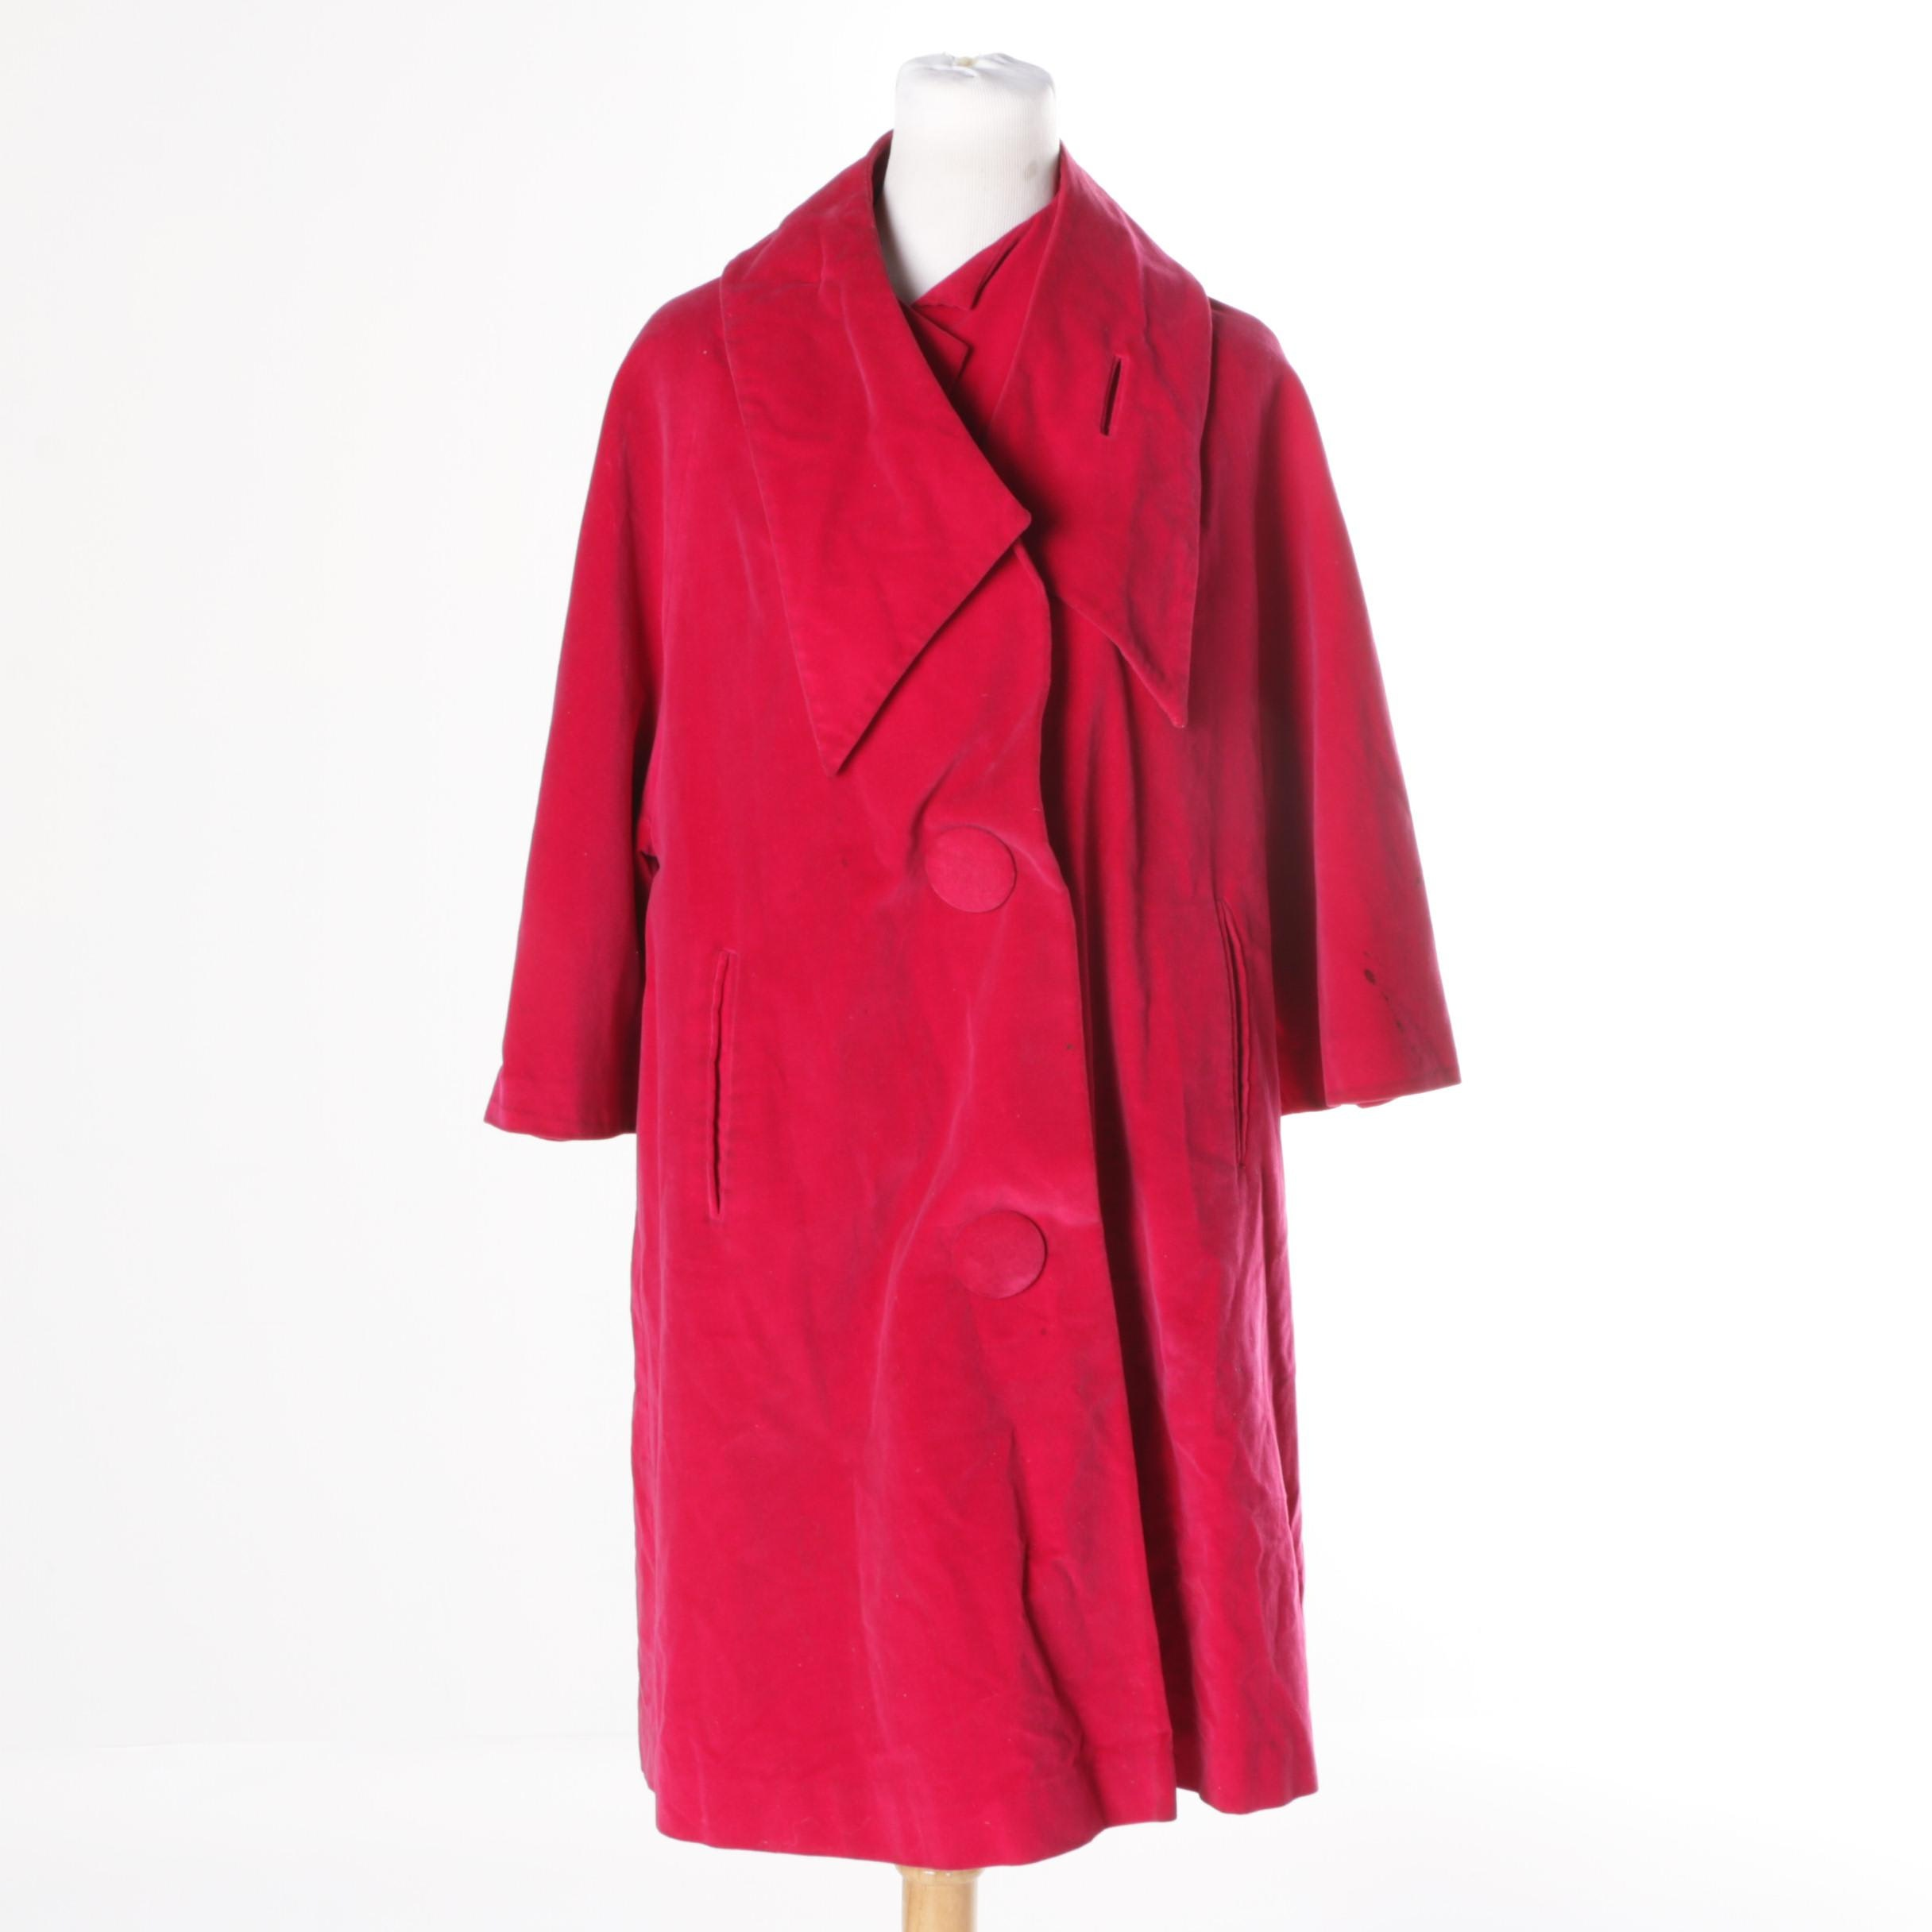 Circa 1960s Vintage Marguerite Rubel Swing Coat